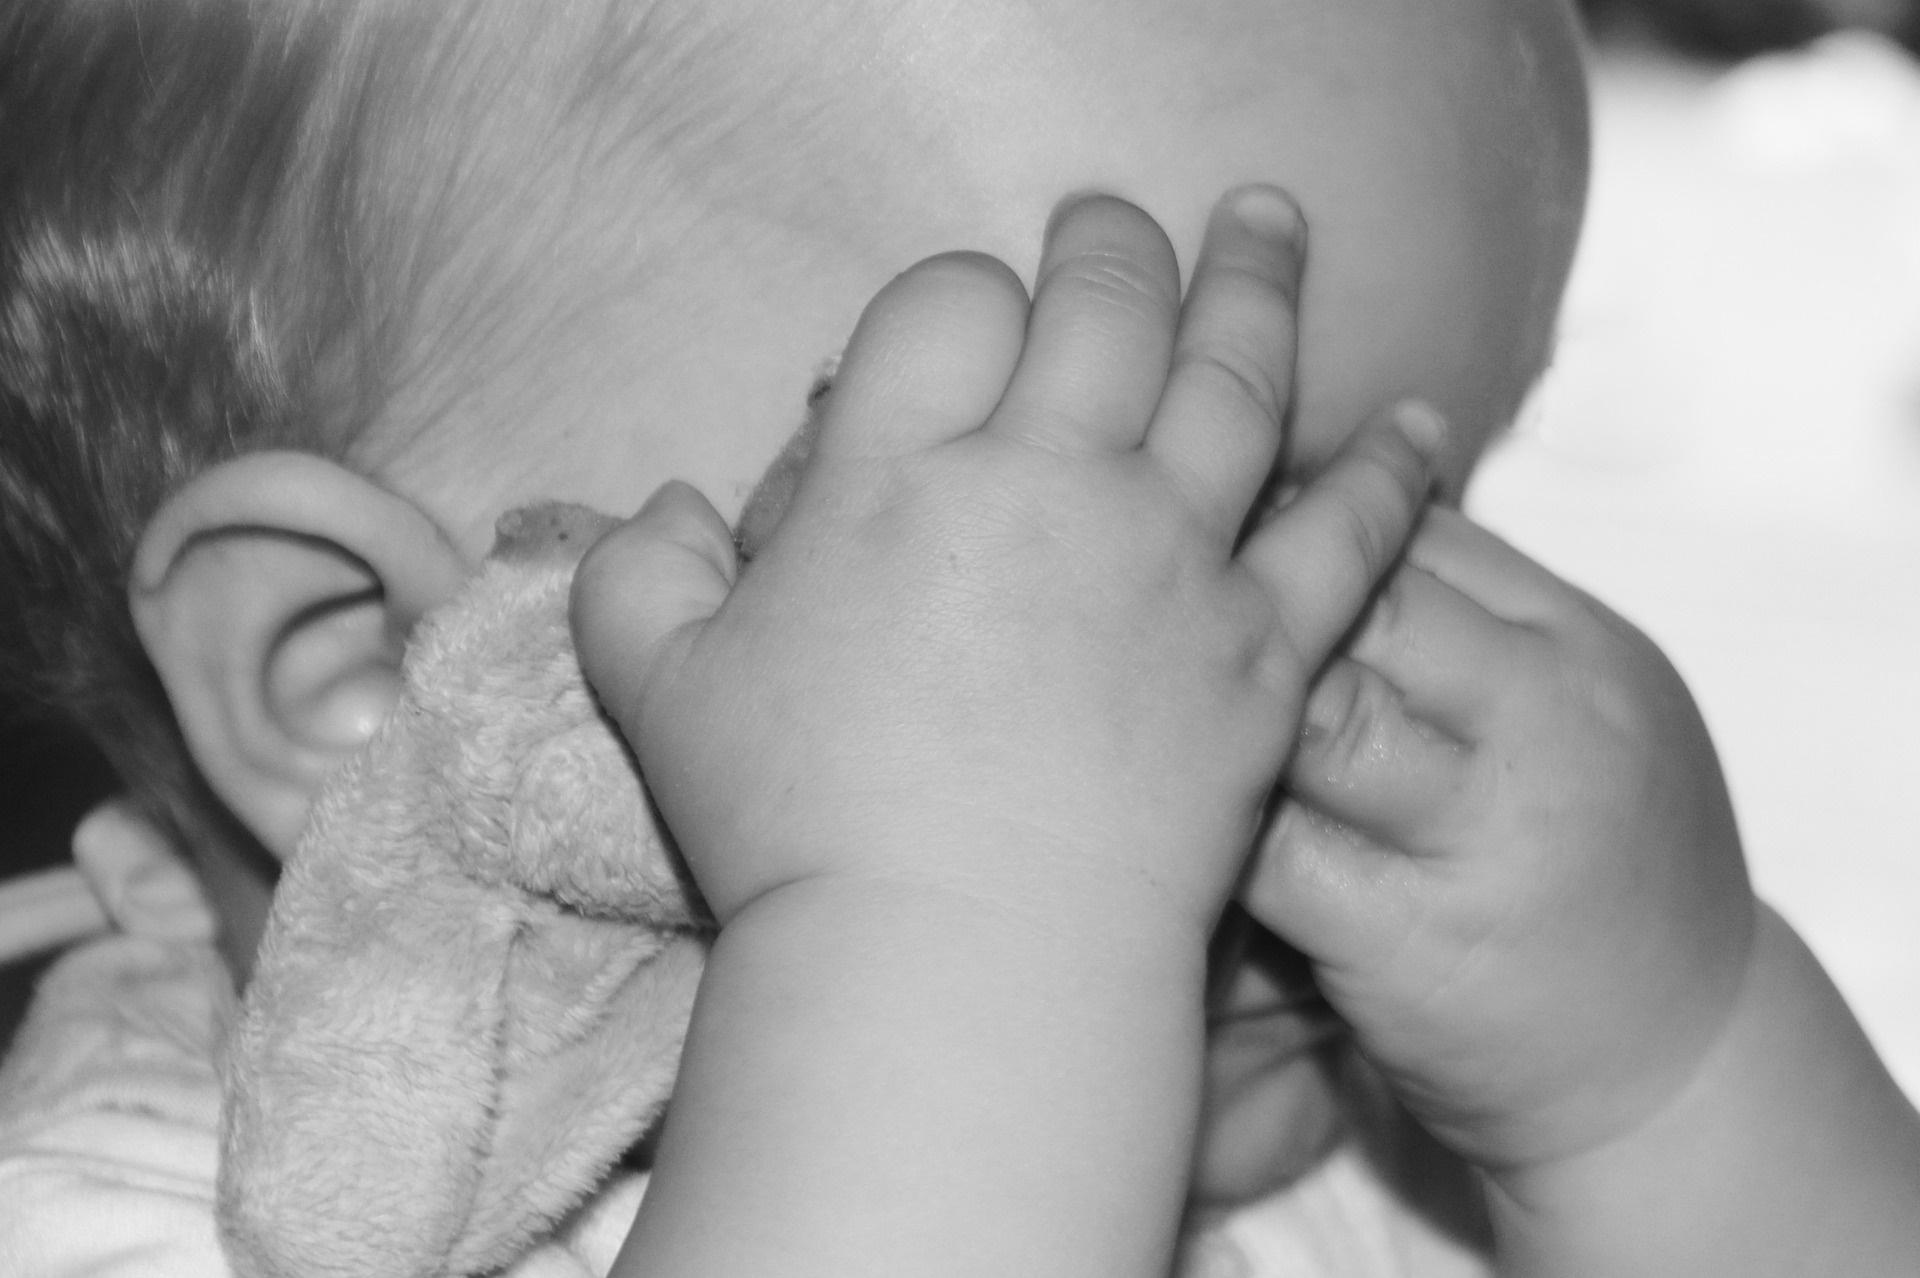 child needing random acts of kindness